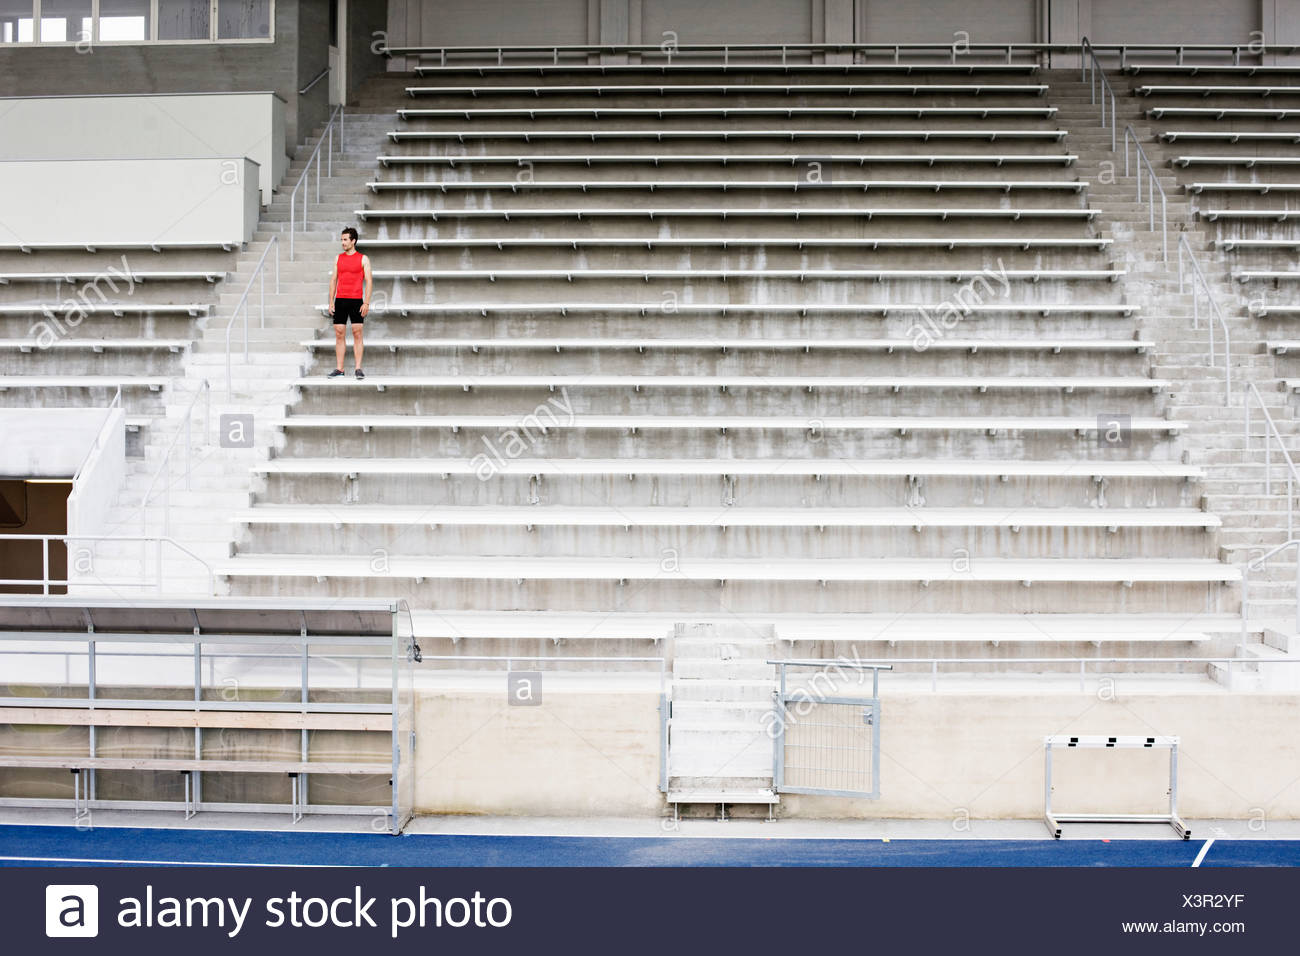 Man standing on stadium steps - Stock Image